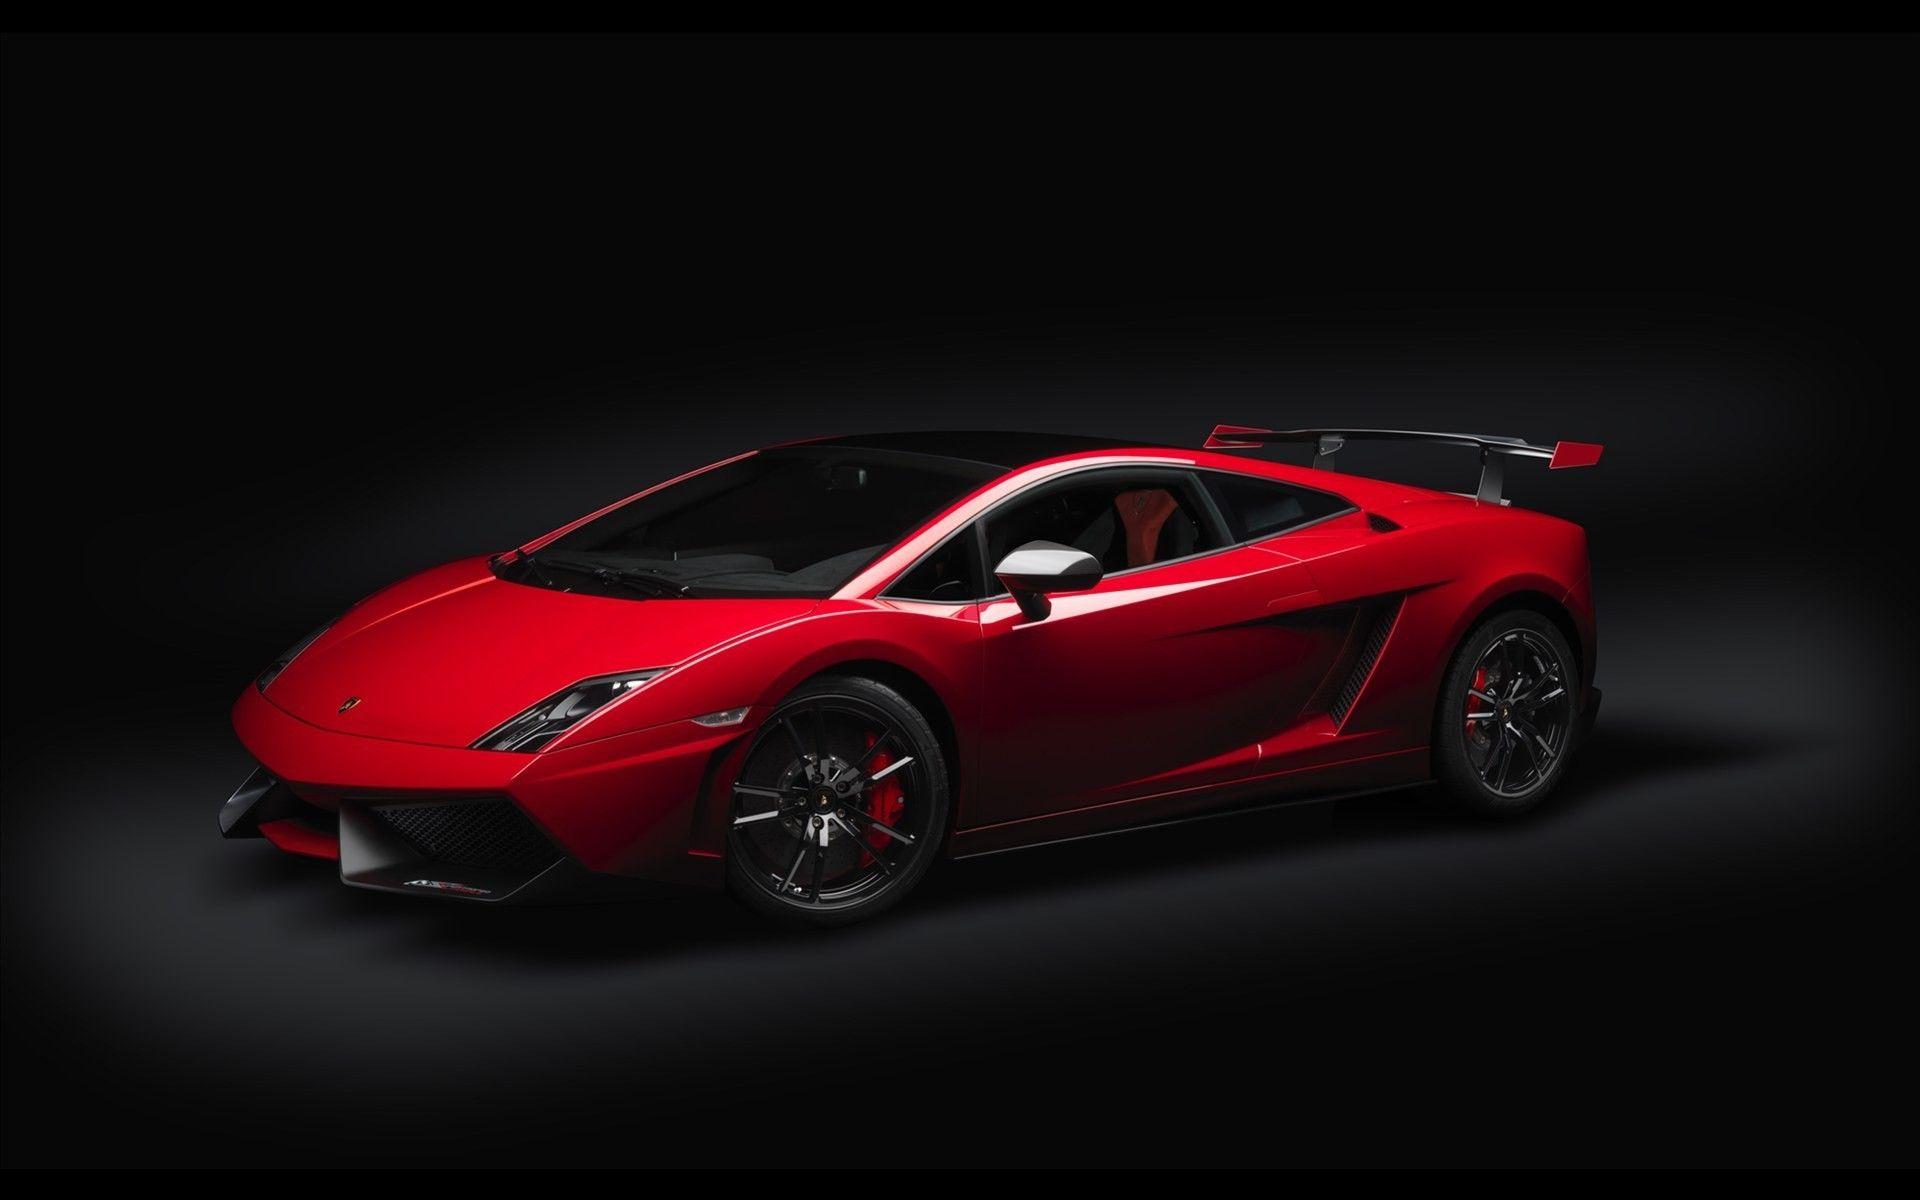 Lamborghini Black Background Cars Red Vehicles Wallpaper Lamborghini Gallardo Red Lamborghini Sports Car Wallpaper